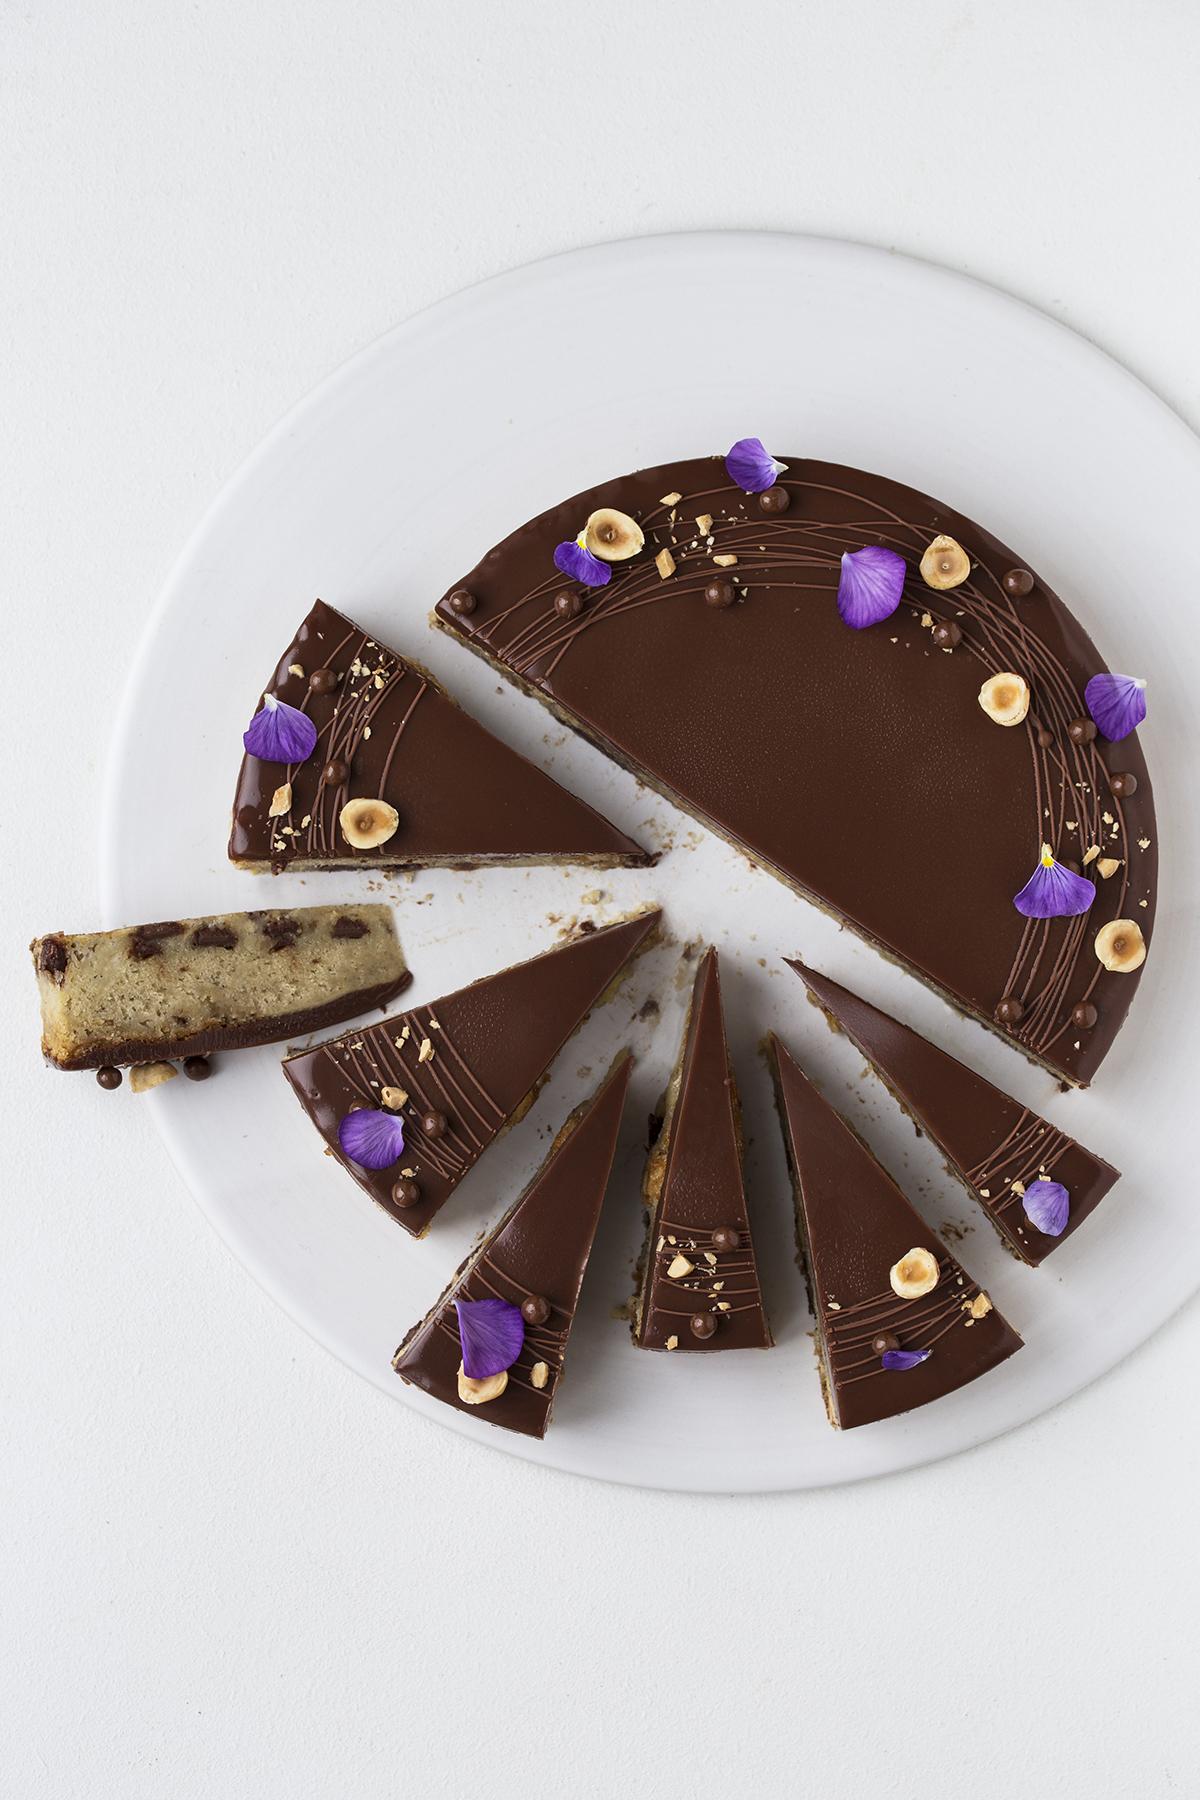 Banankage Med Chokolade Maja Vase